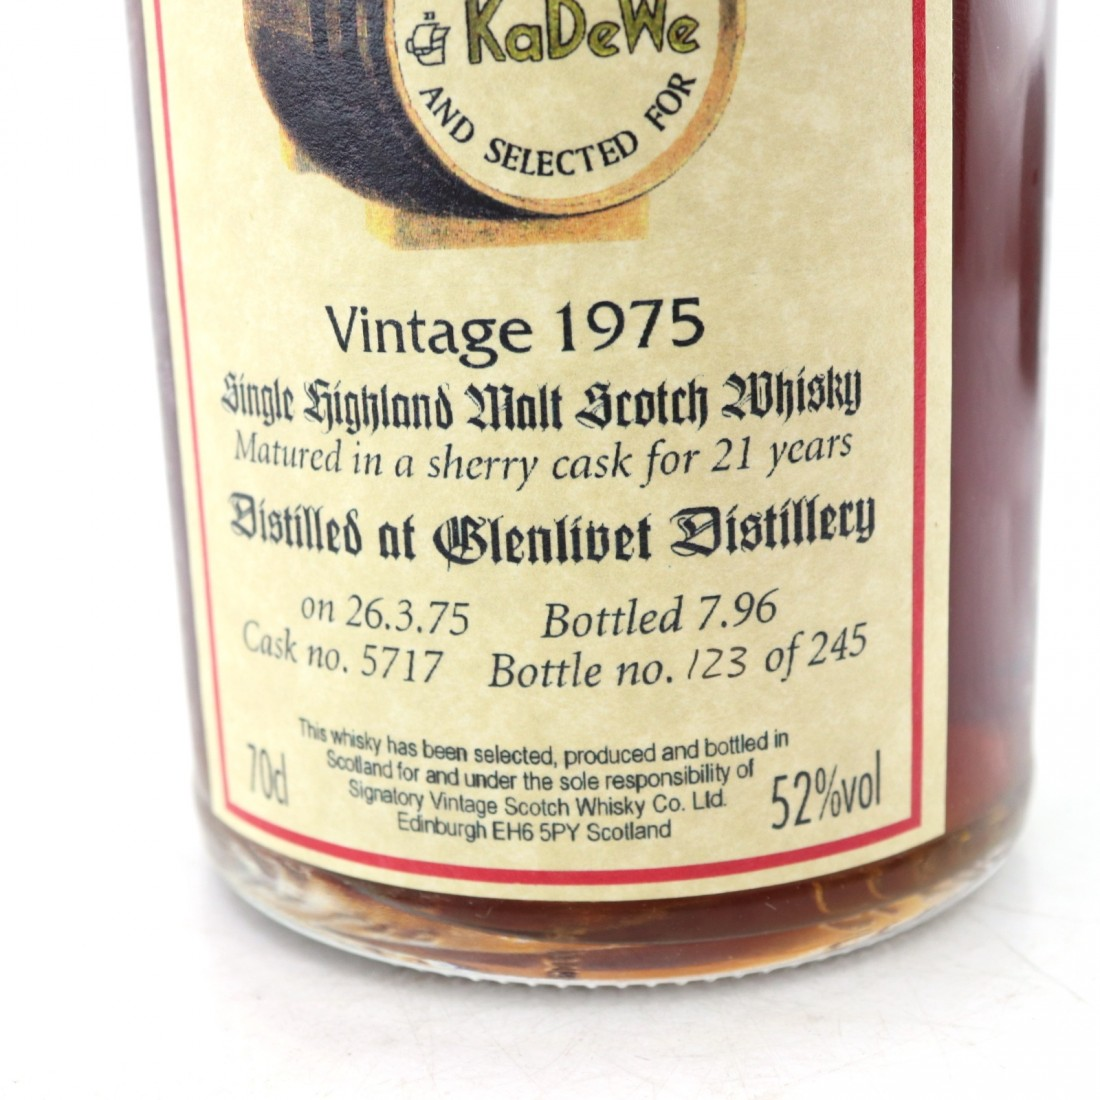 Glenlivet 1975 Signatory Vintage 21 Year Old / KaDeWe